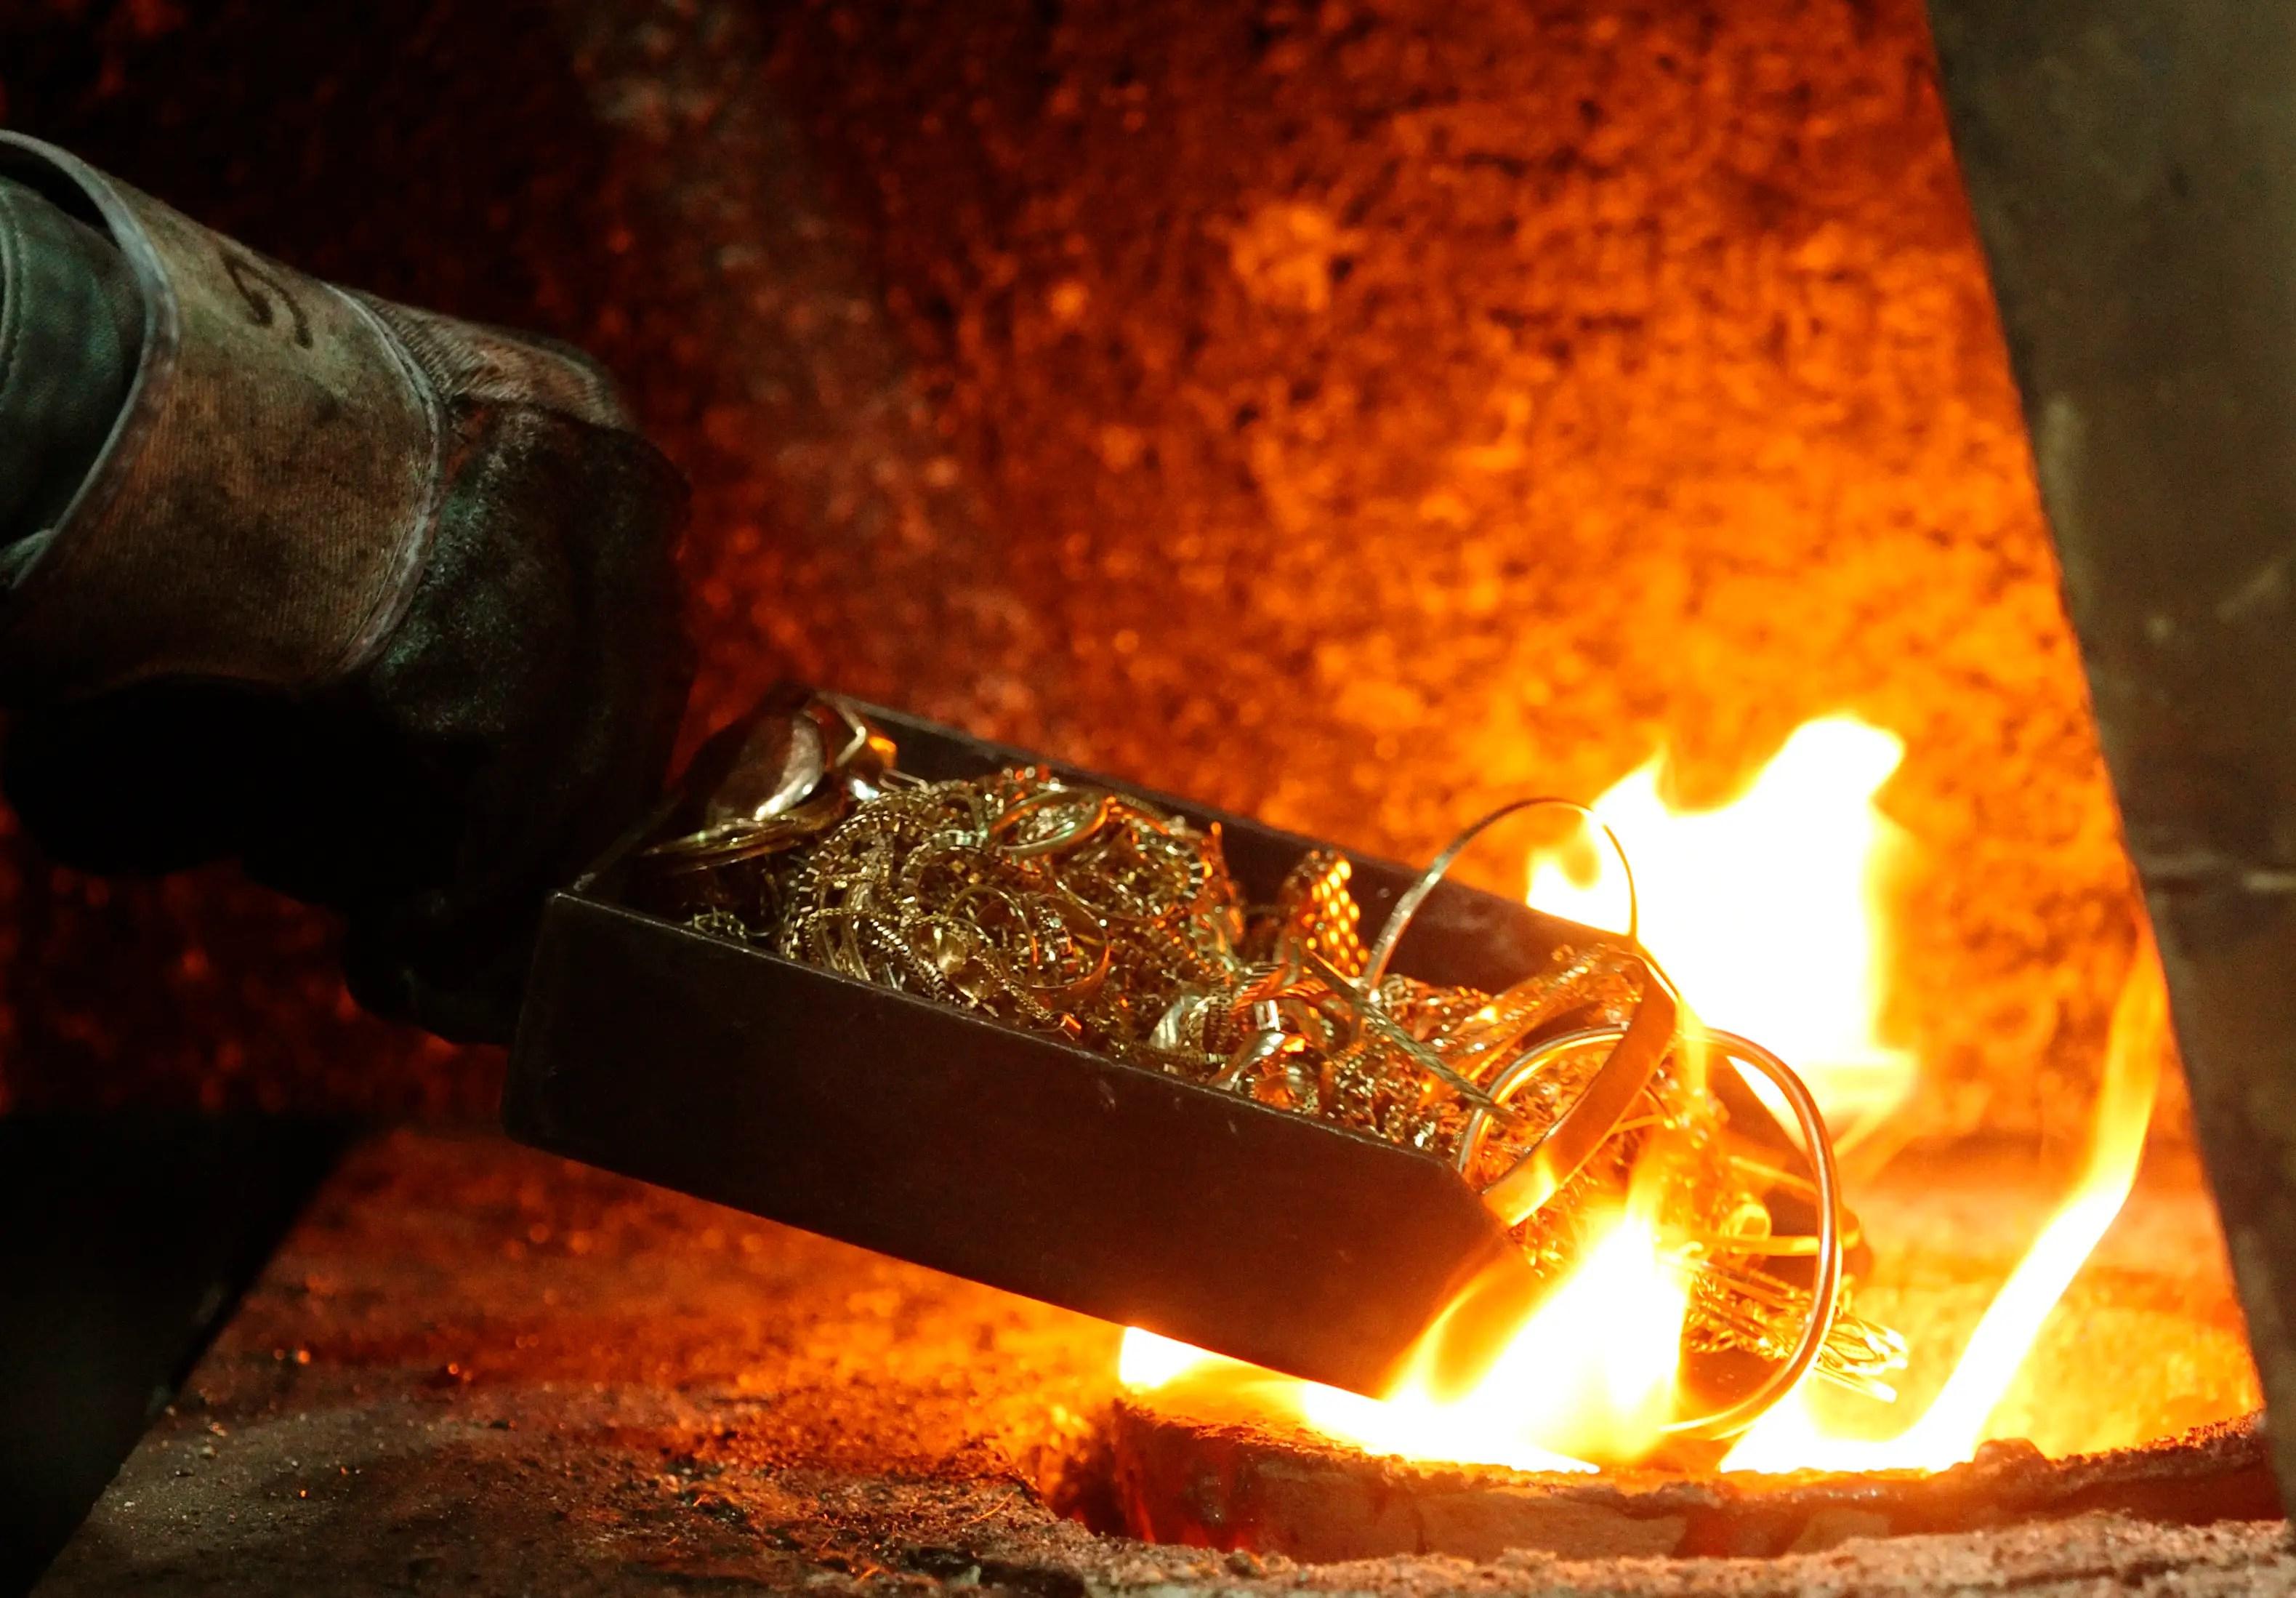 'El Chapo' Guzmn's Sinaloa cartel was melting down its